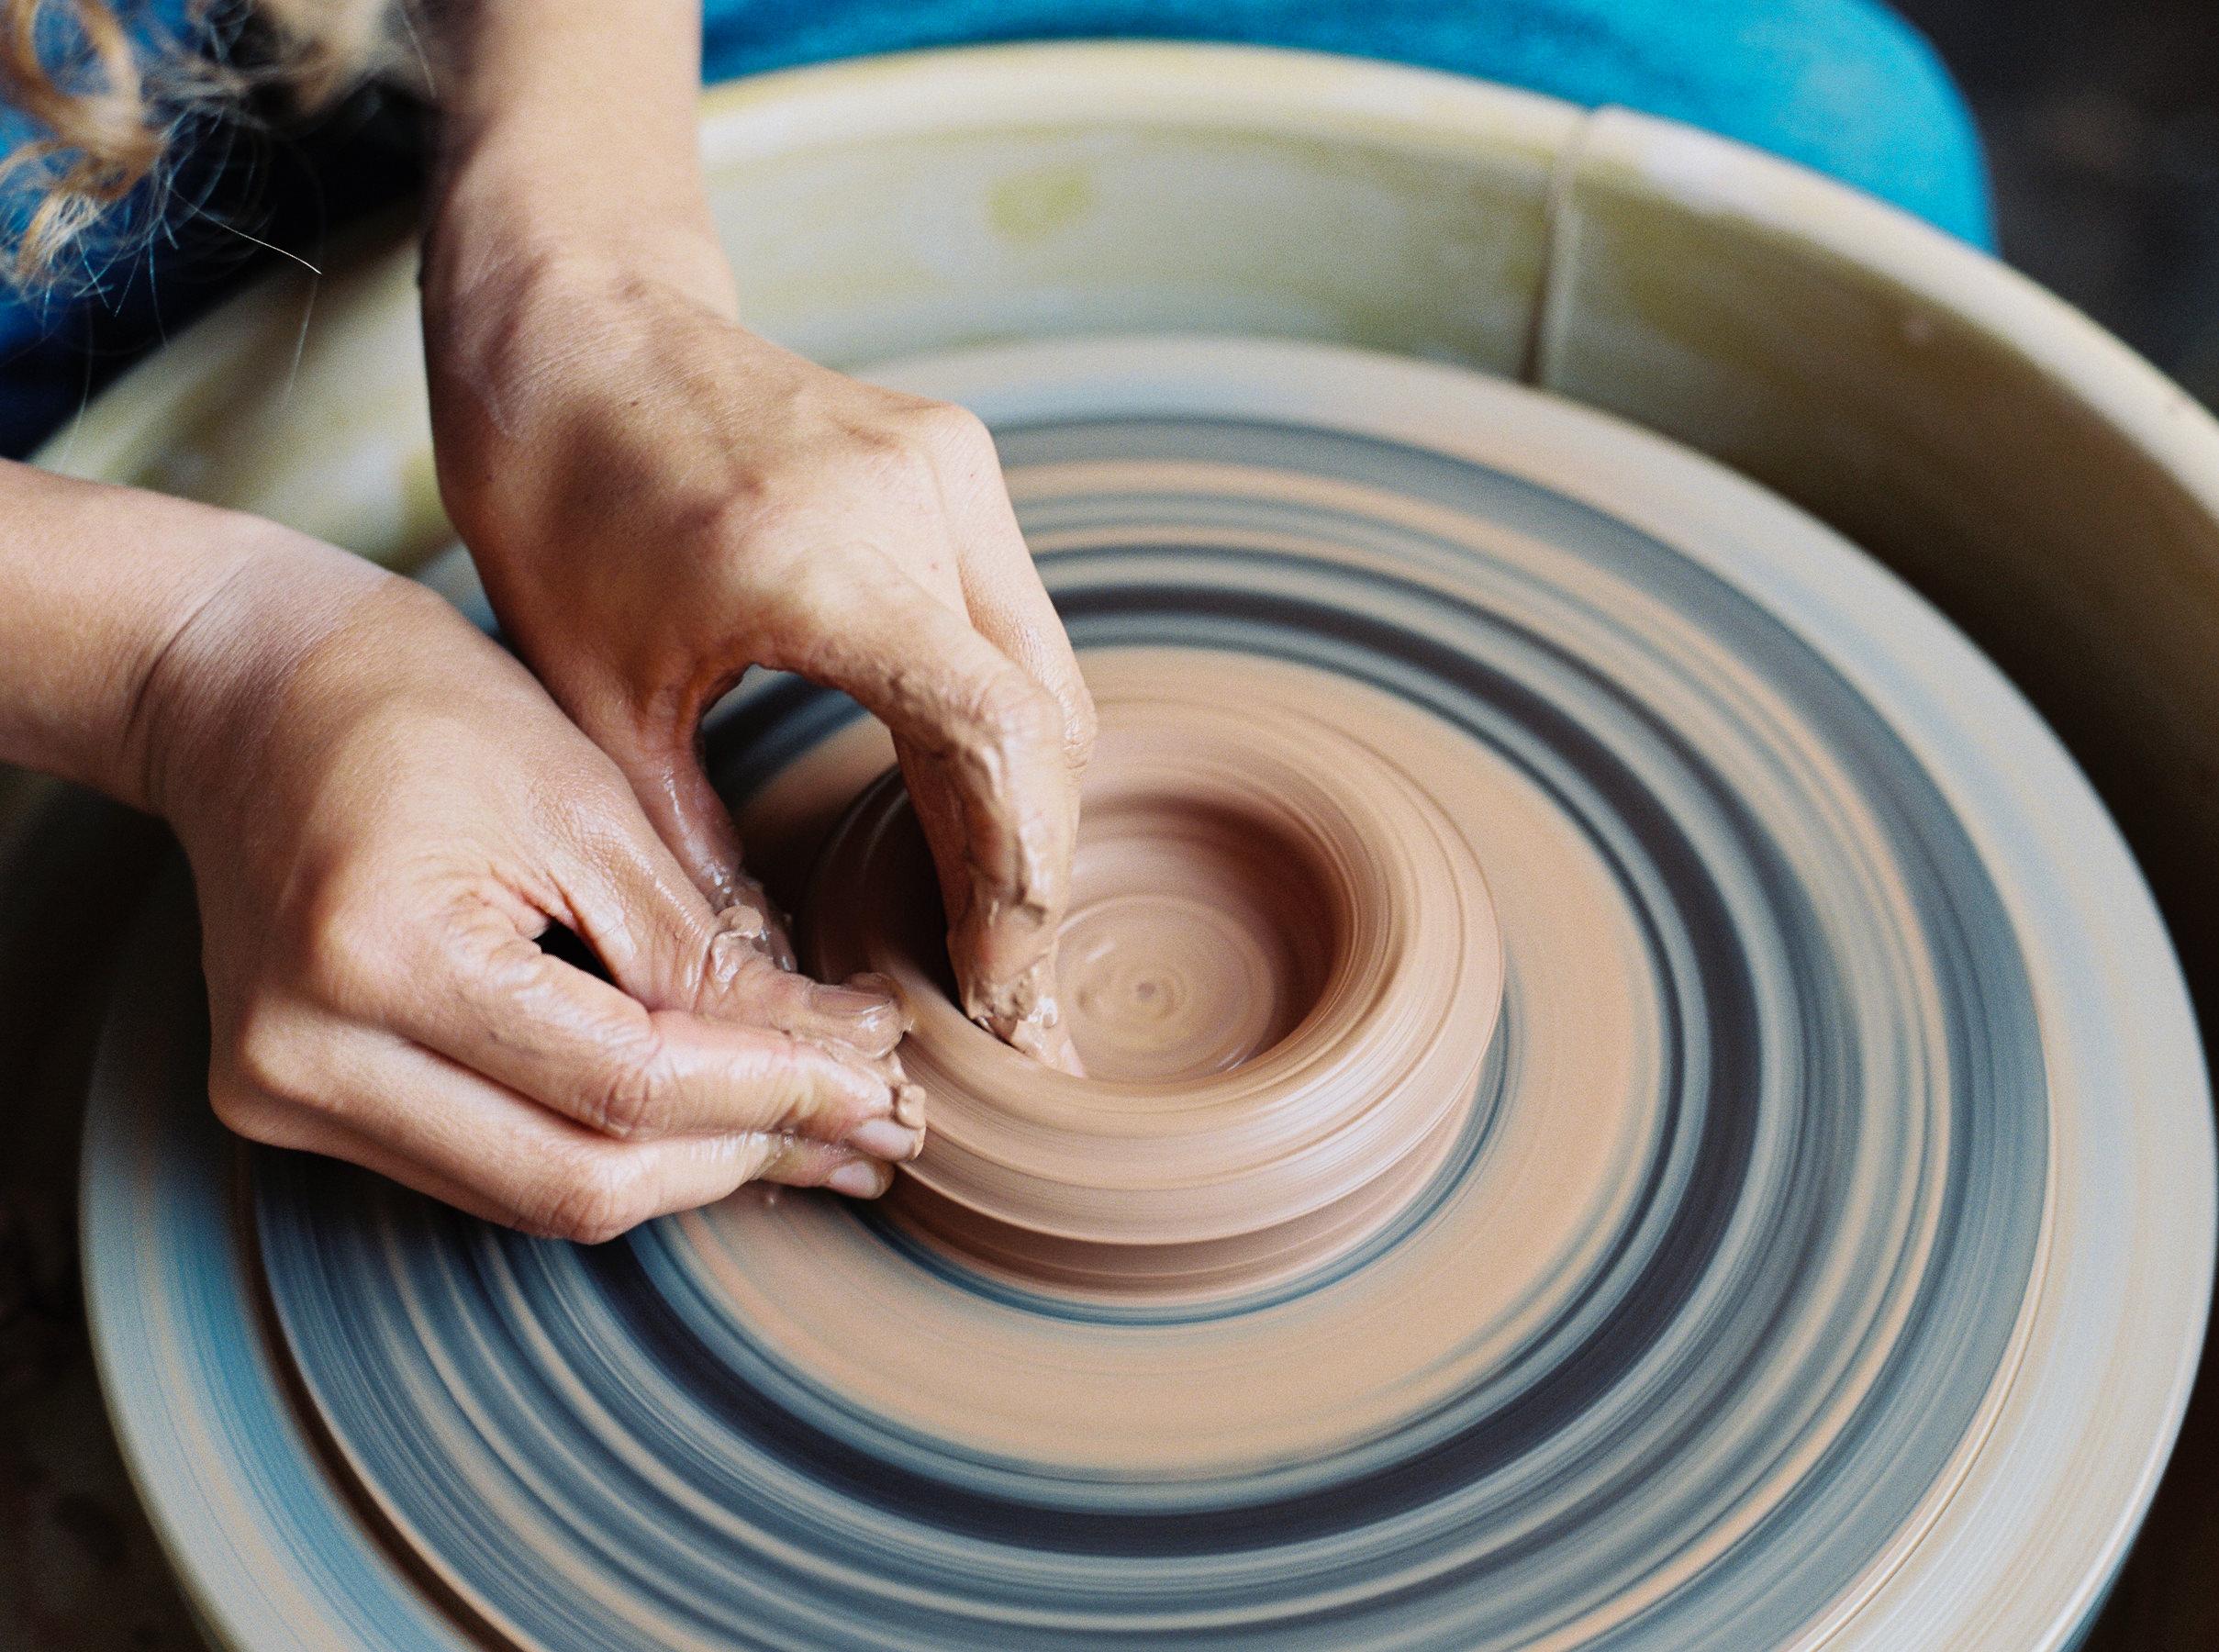 artistprofile-katherinemoes-pottery-annapeters-annapetersphoto-unearthing.tc-3.jpg